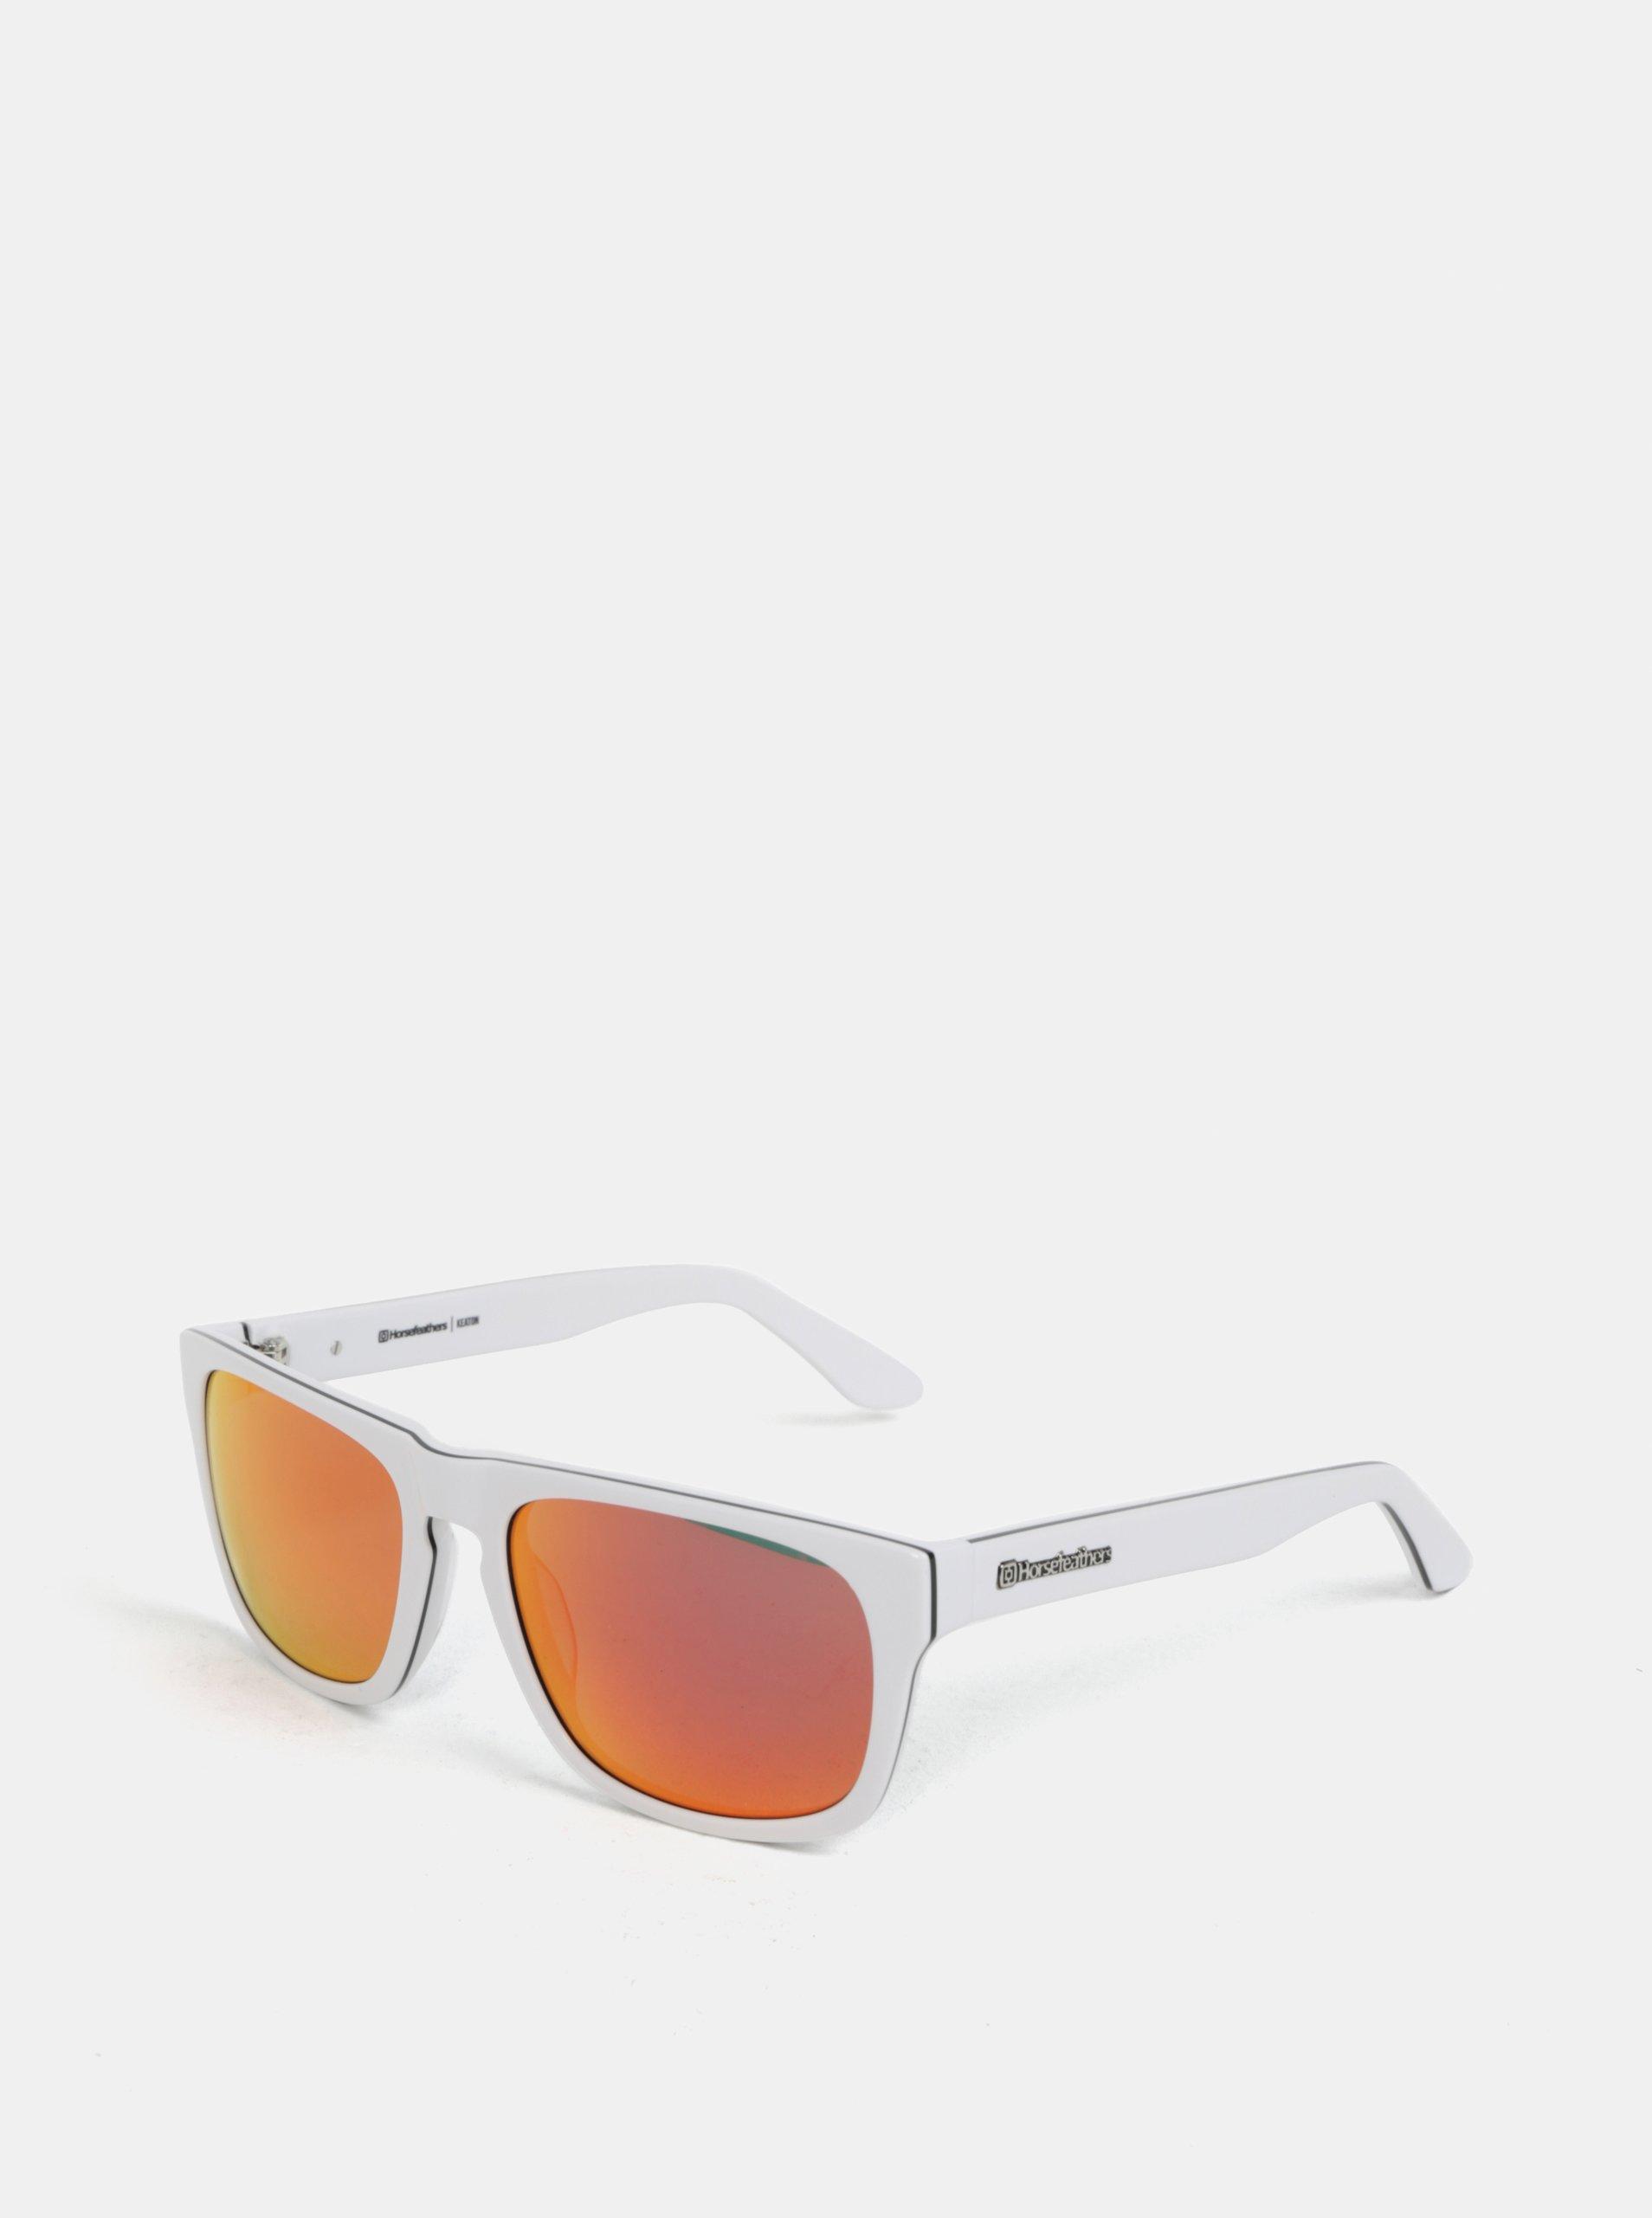 1710af48f Červeno-biele pánske slnečné okuliare Horsefeathers Keaton | Moda.sk